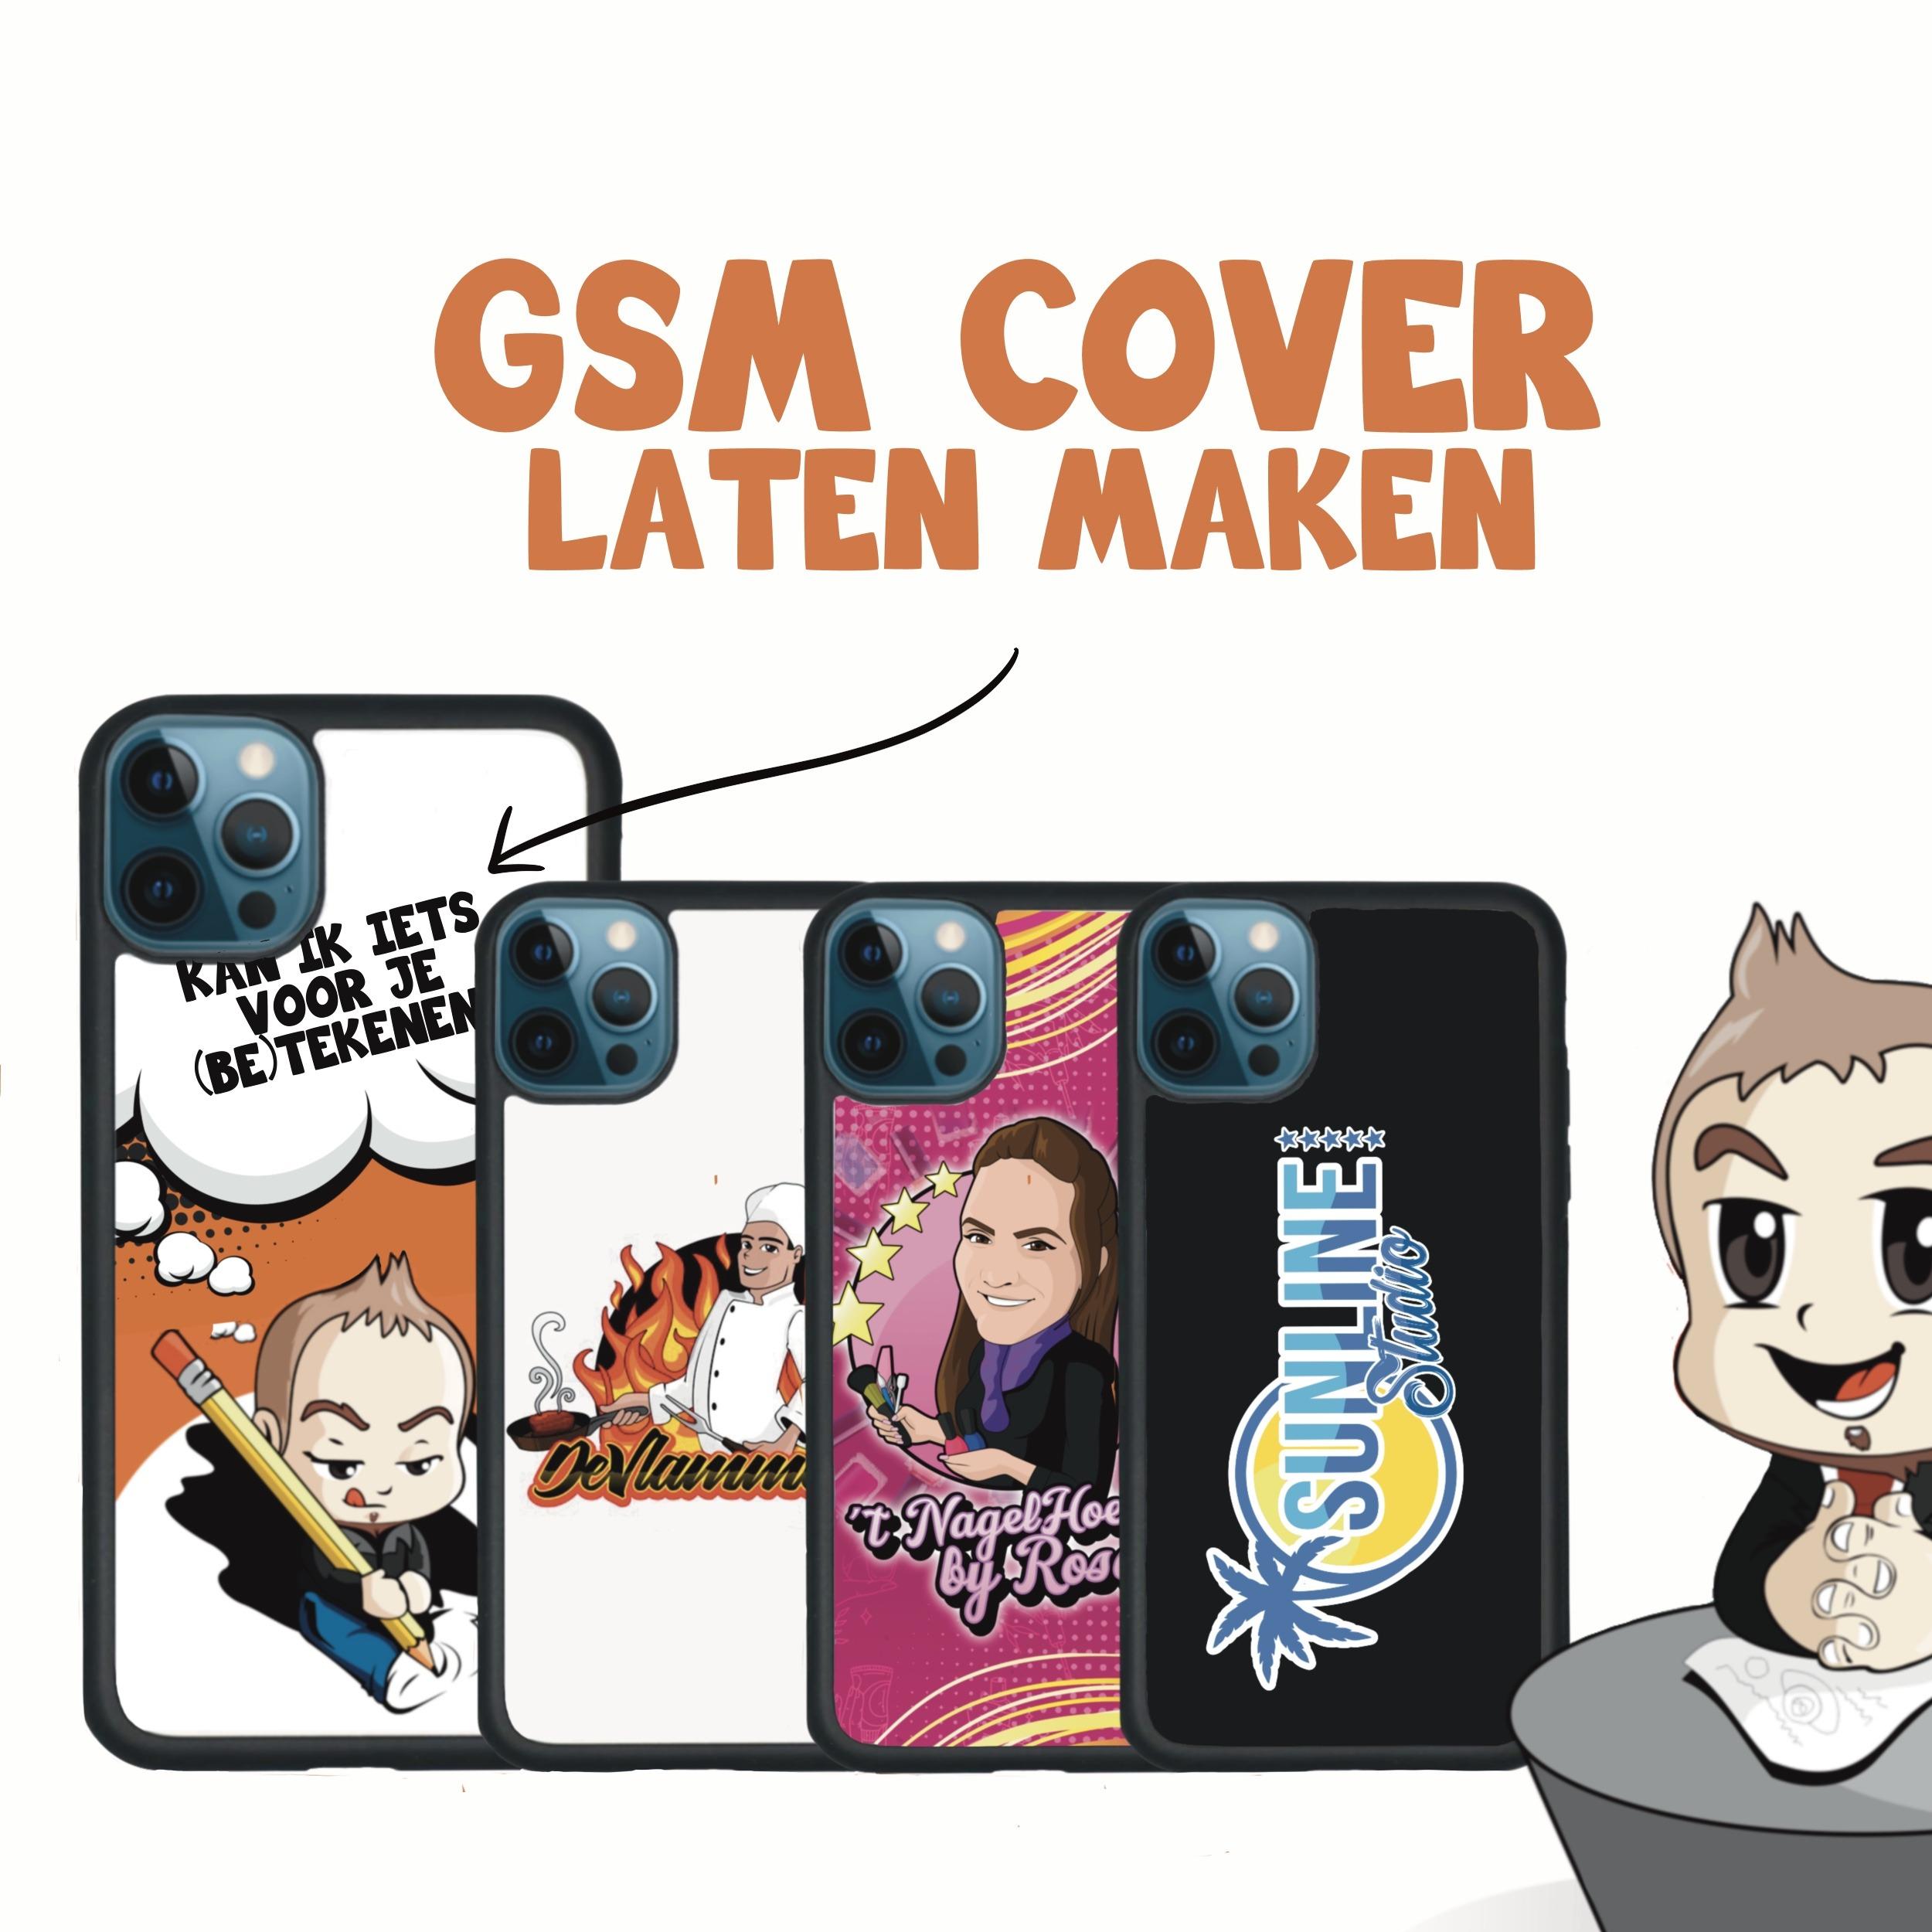 gsm cover laten maken